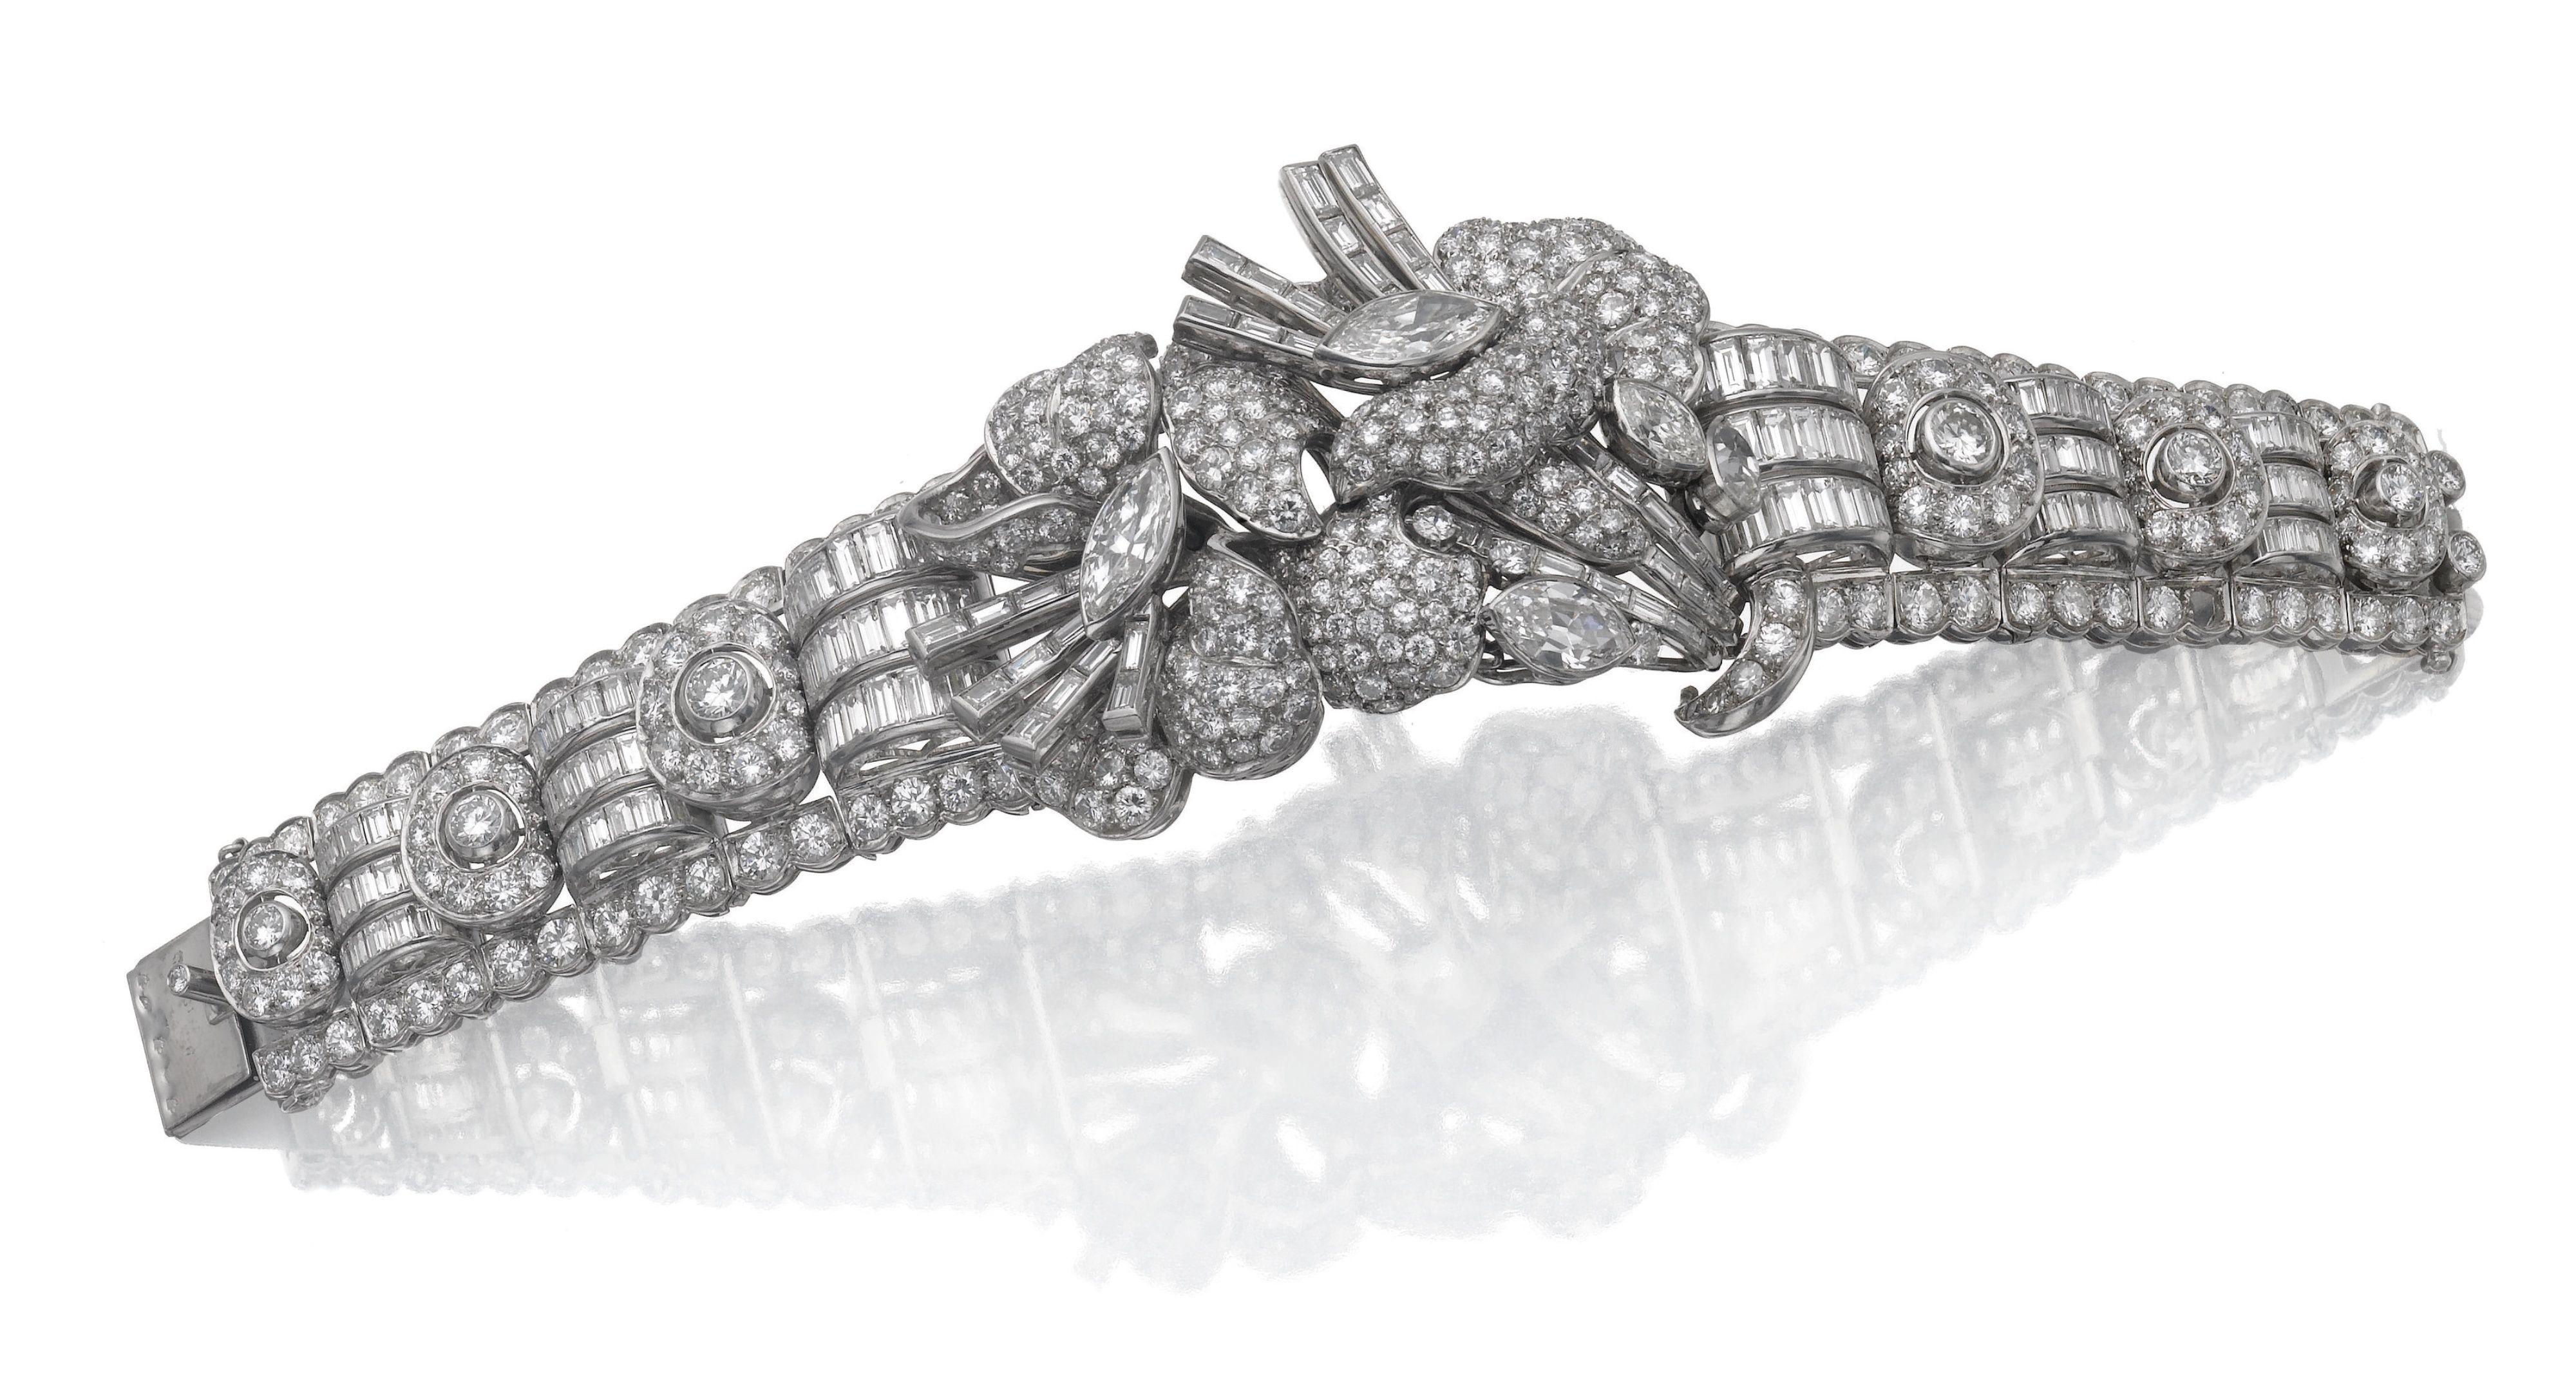 Diamond bracelet ucpuesucpue lot sothebyus armschmuck